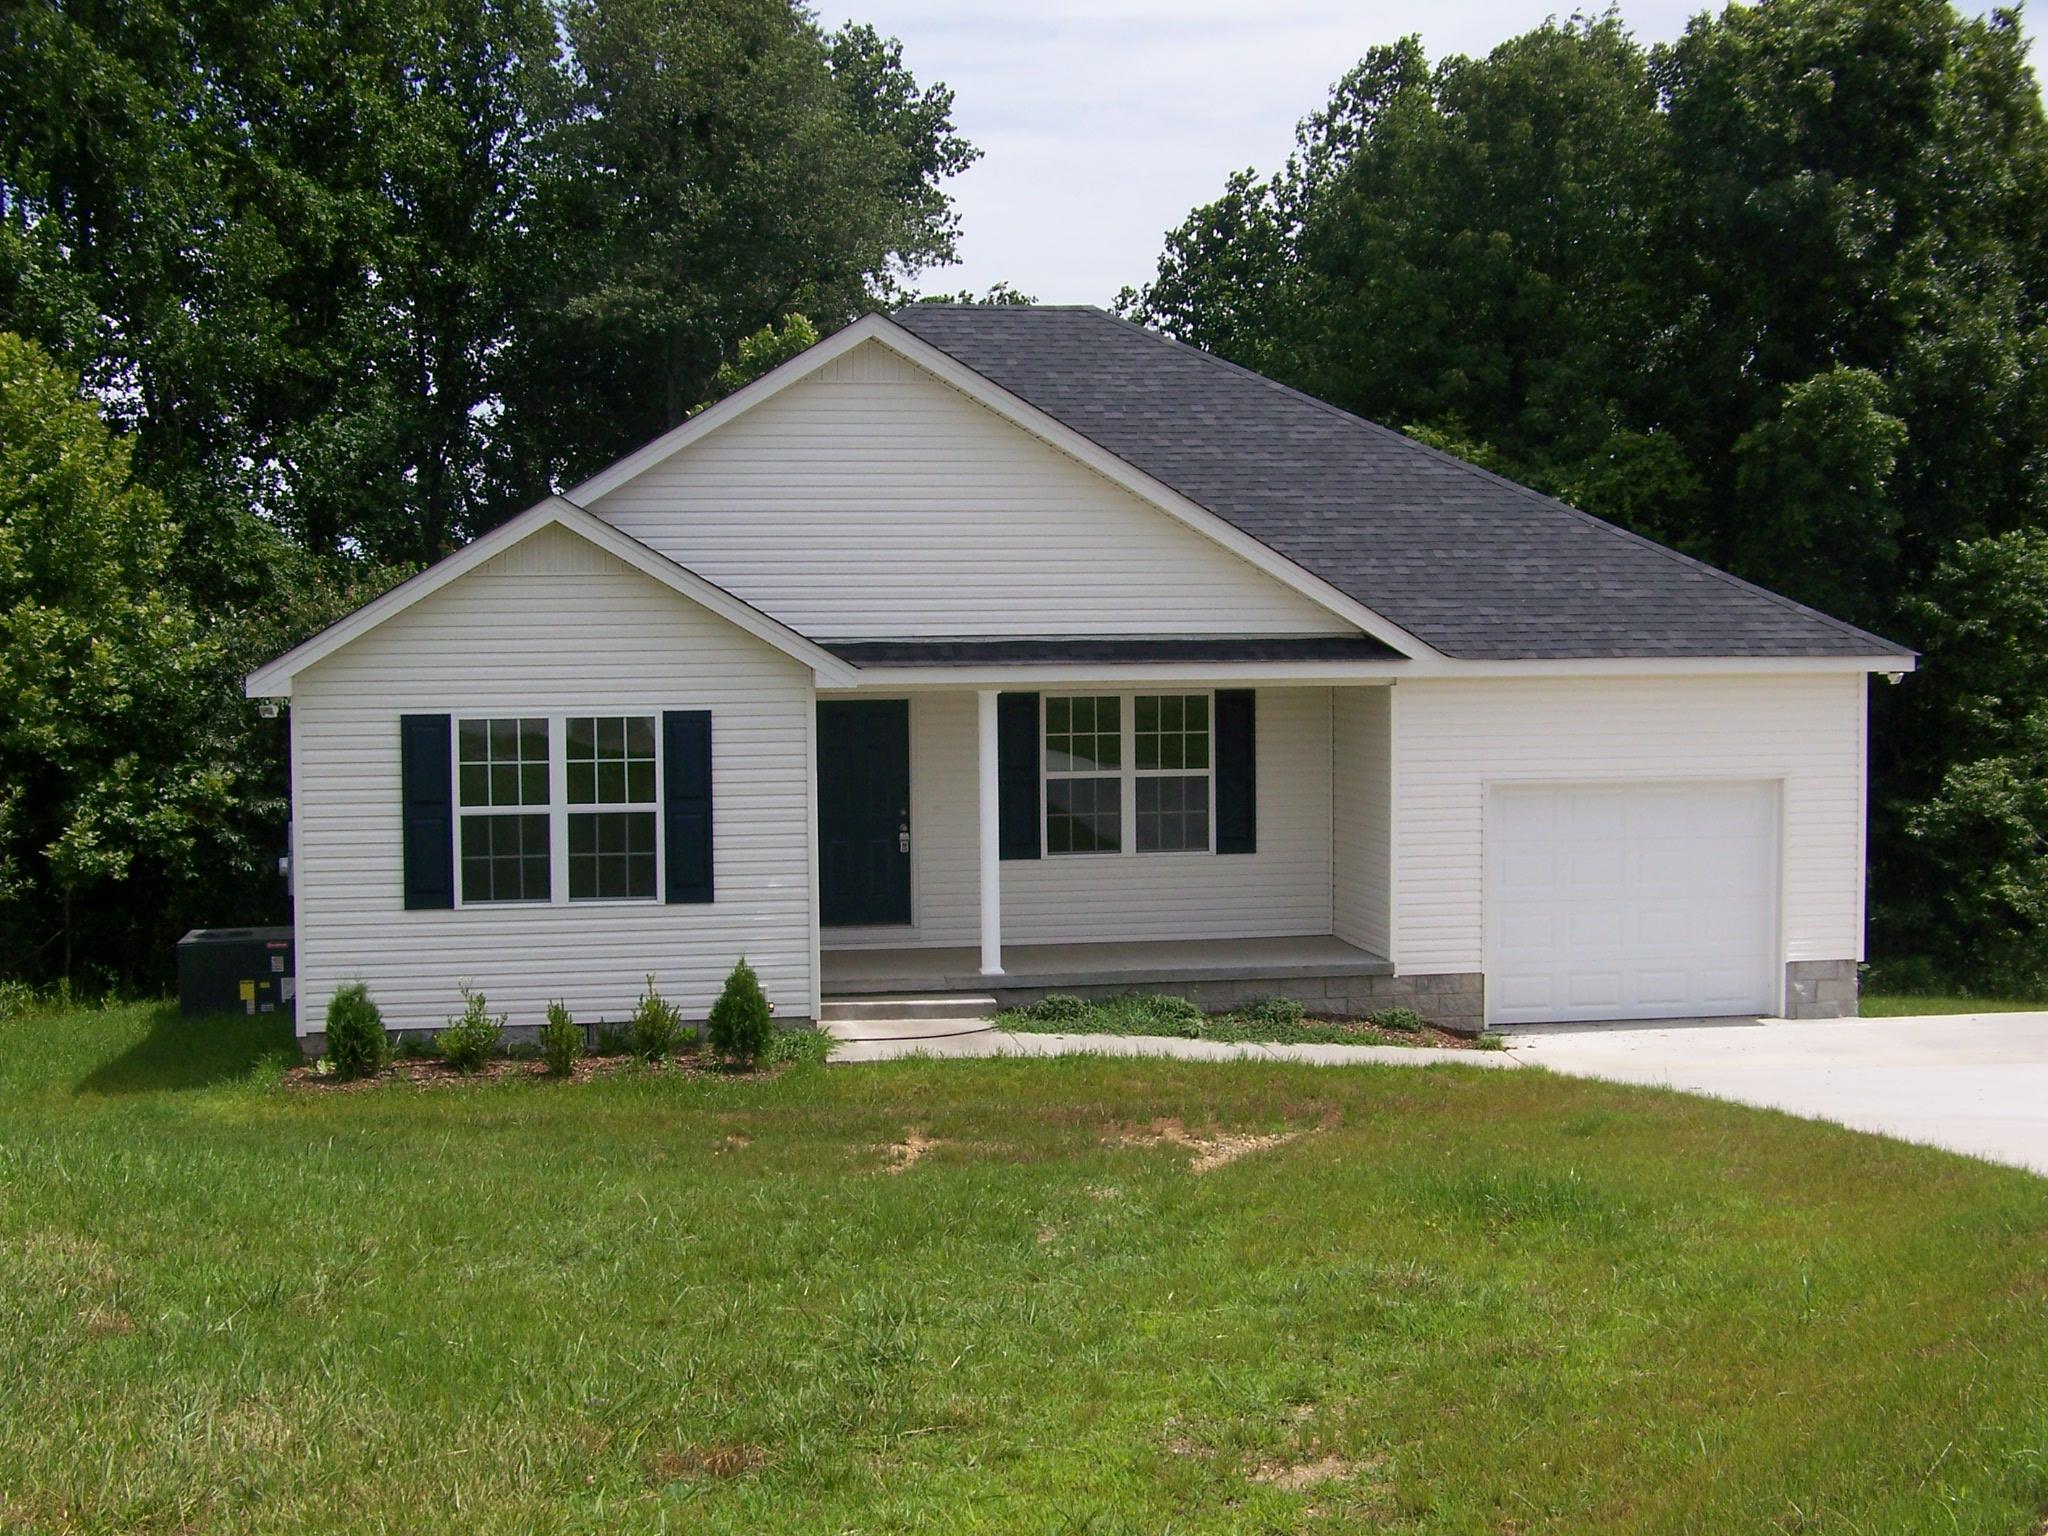 142 Sunrise Ridge Rd, Pulaski, TN 38478 - Pulaski, TN real estate listing